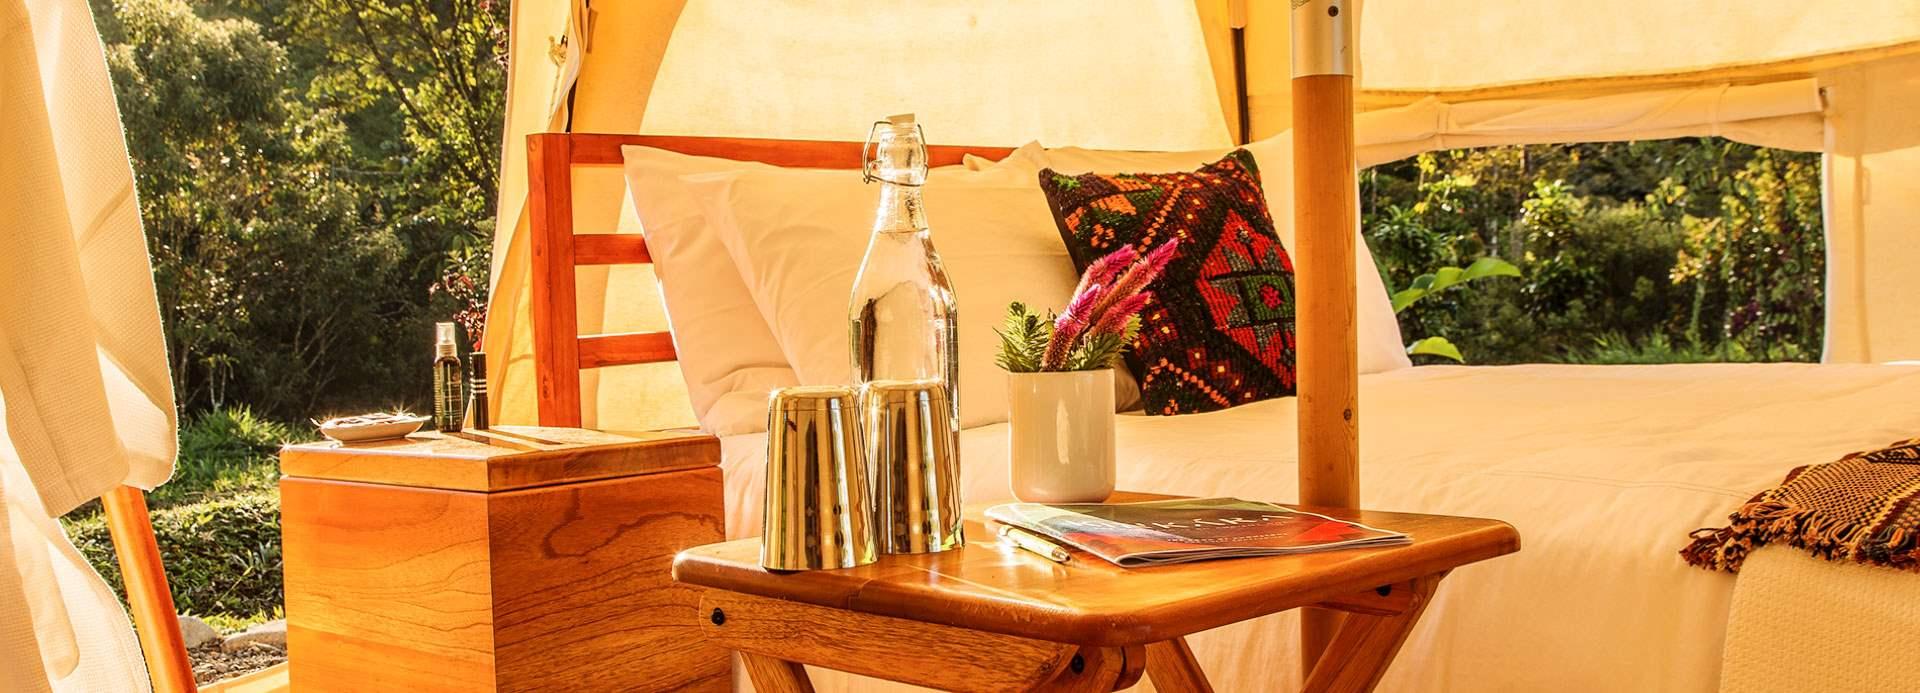 Immersive Tent Suites at Kinkara Santa Elena